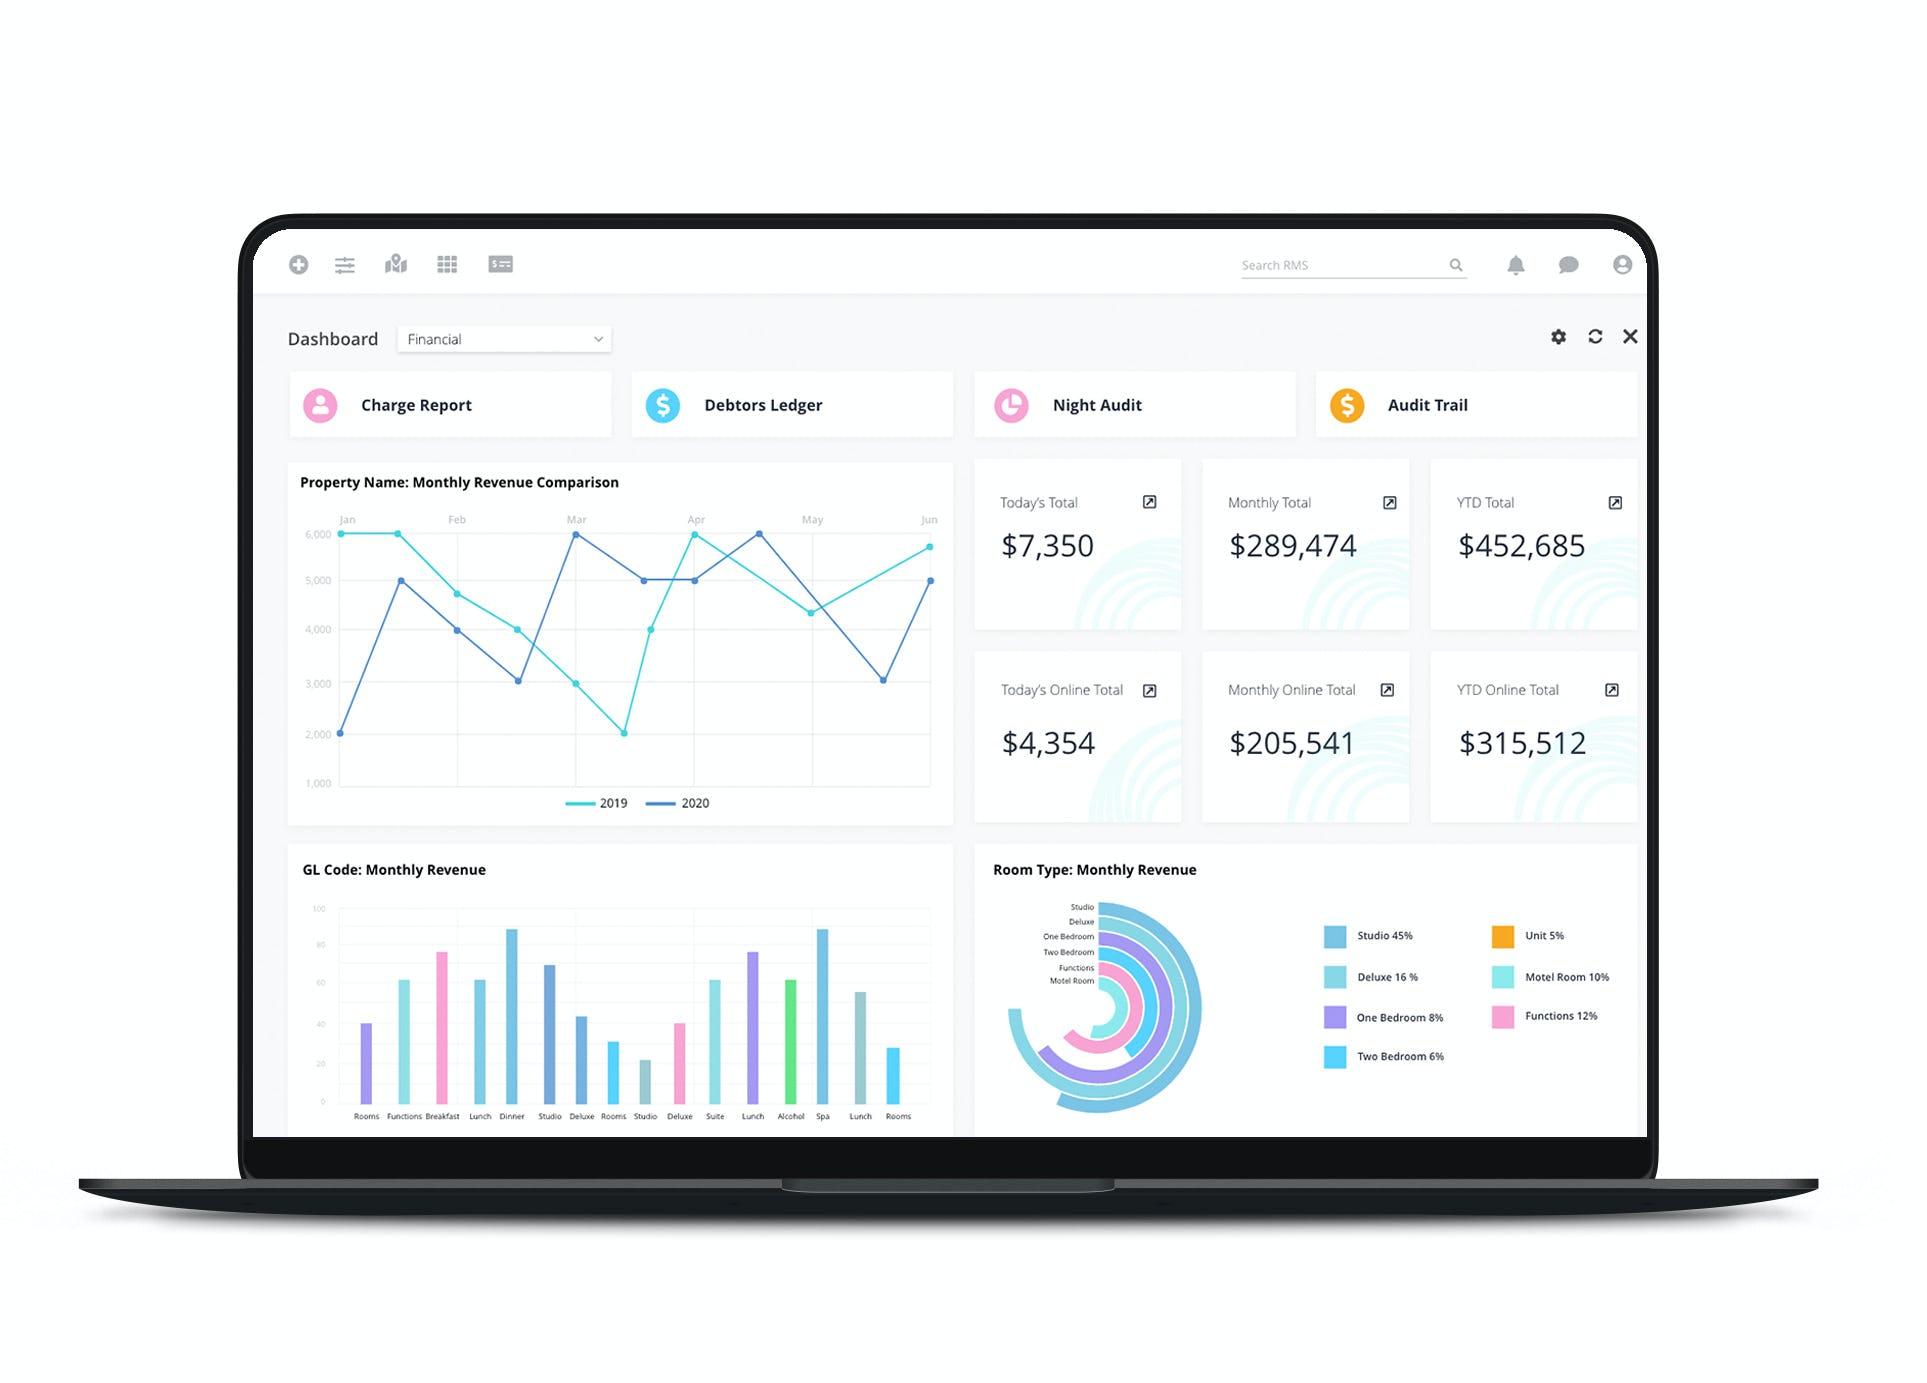 RMS Cloud Software - RMS Dashboard